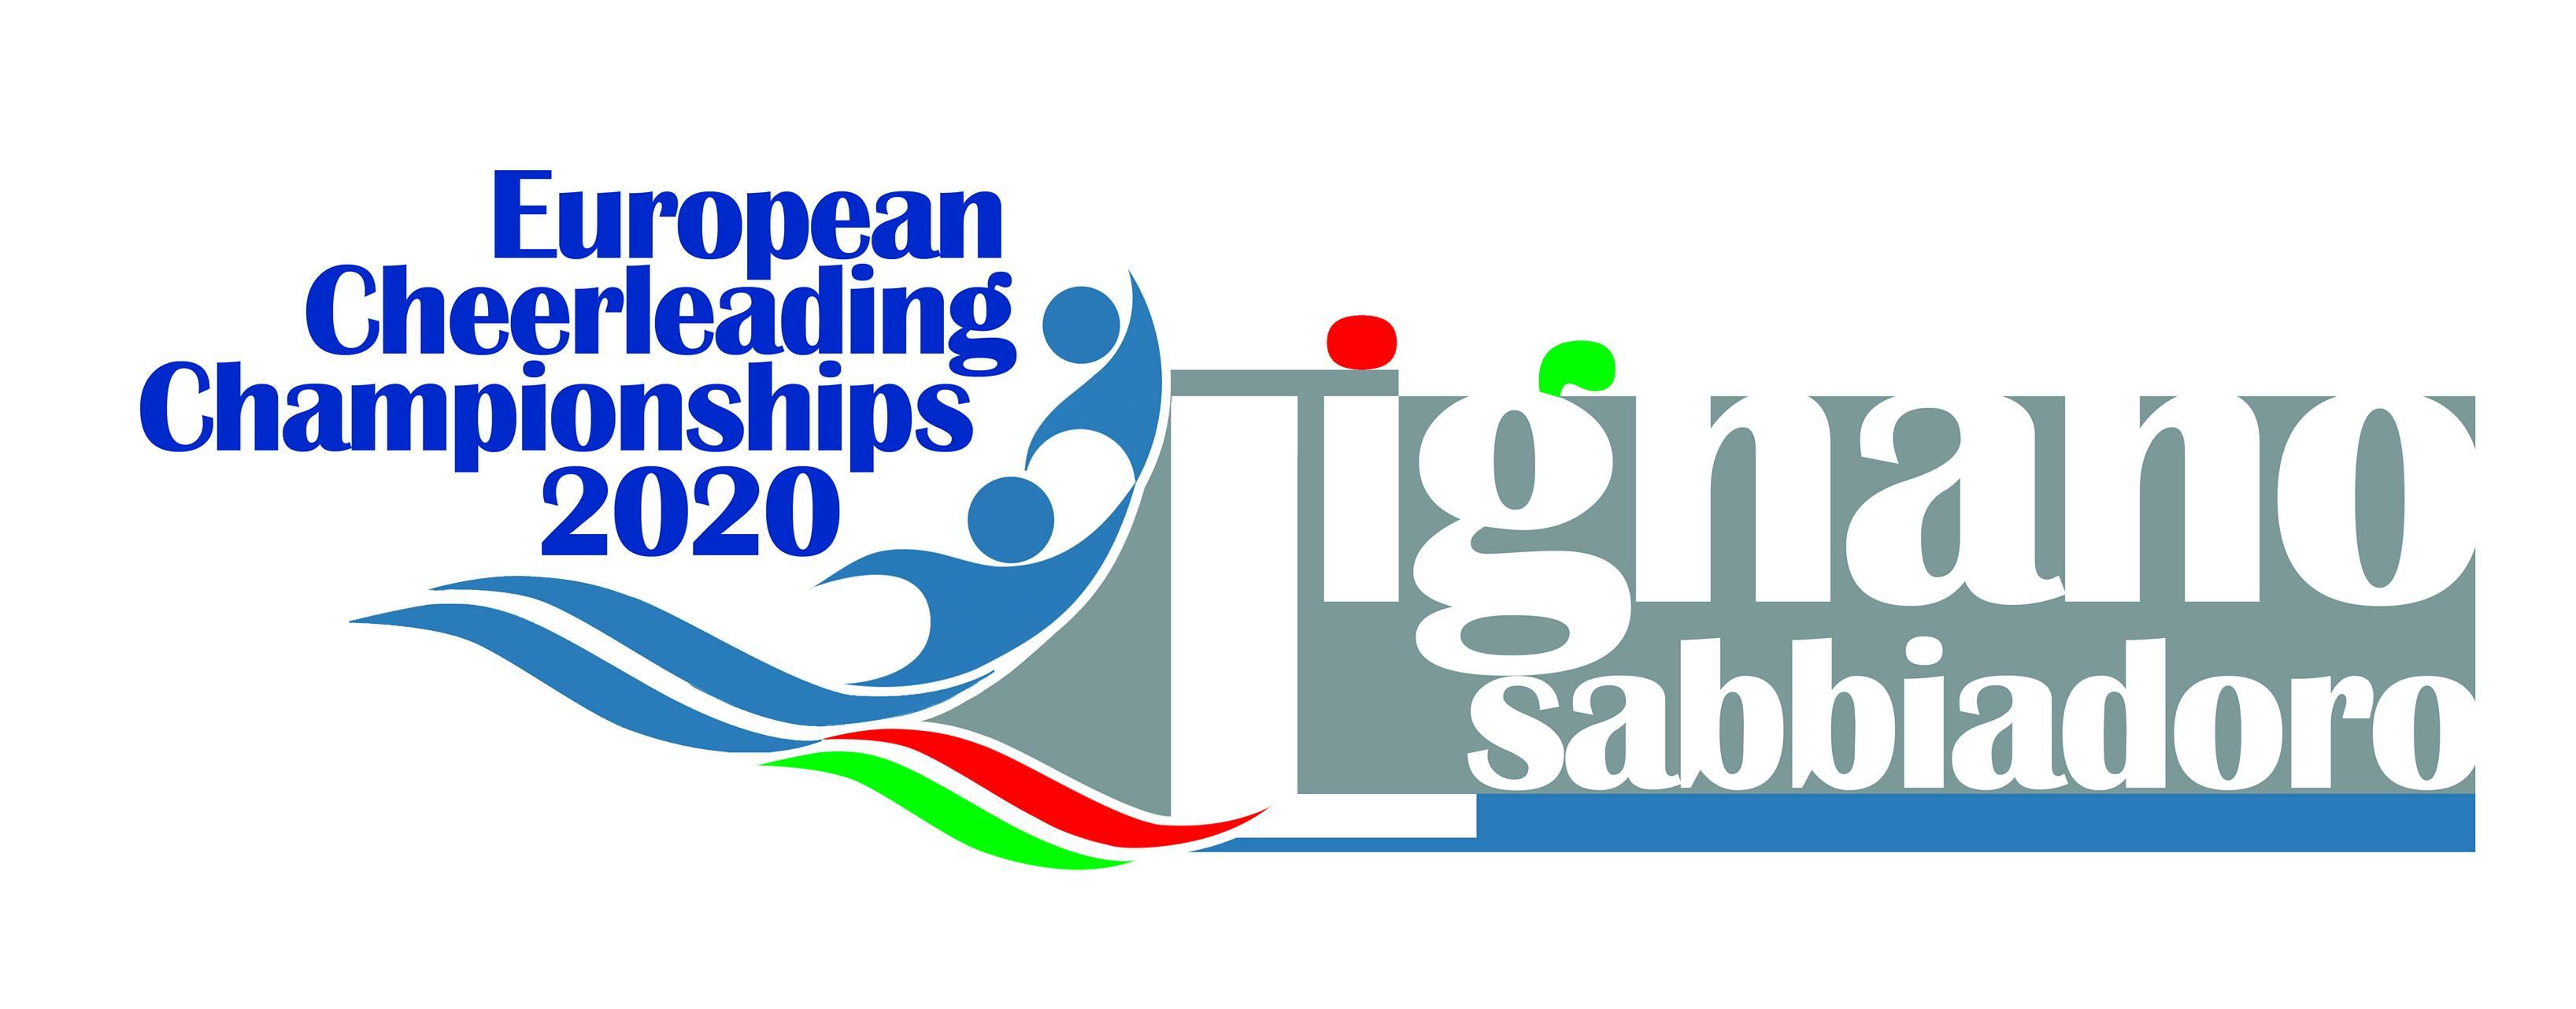 CANCELLED  -  EUROPEAN CHEERLEADING CHAMPIONSHIP 2020 @ LIGNANO - SABBIADORO, ITALY